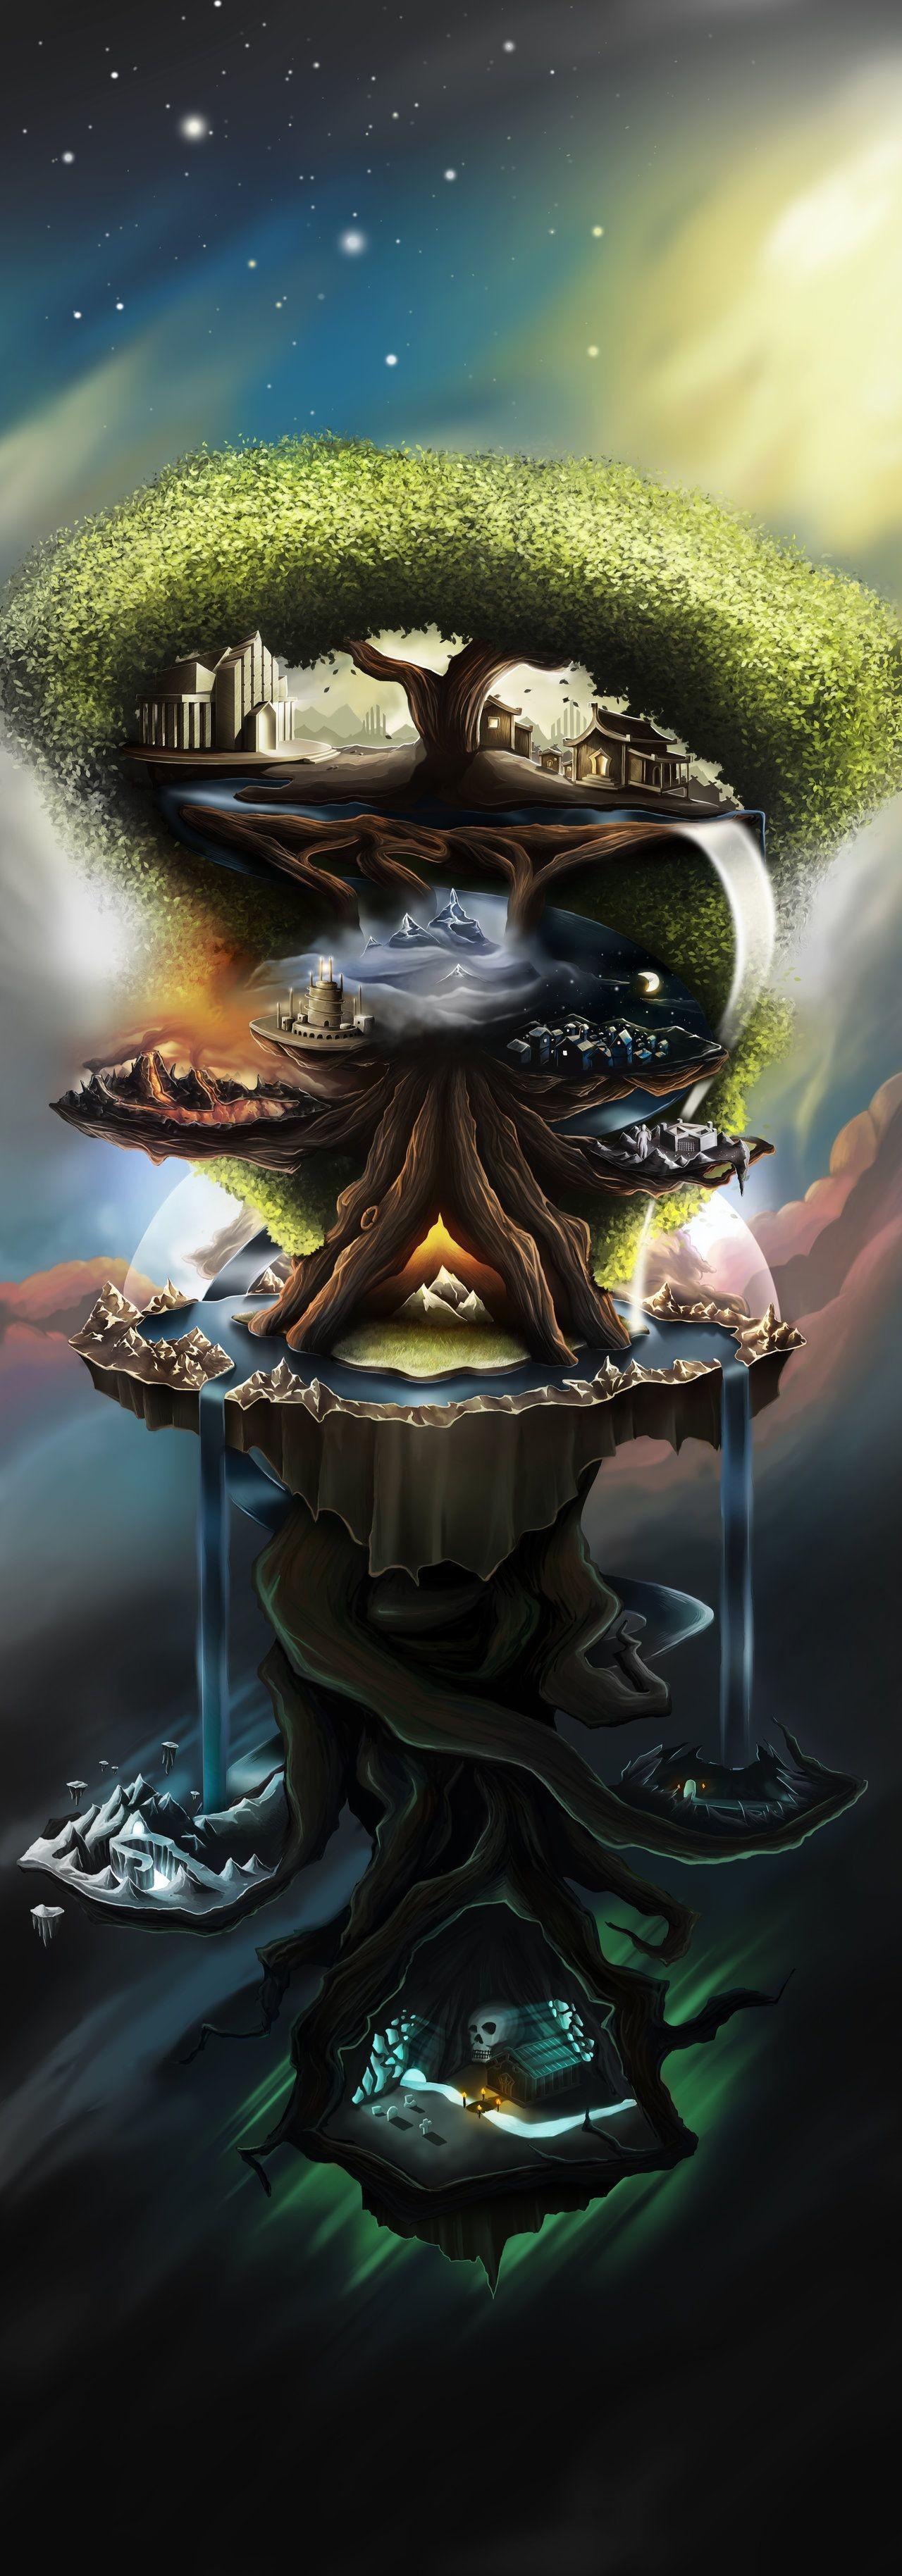 Res: 1280x3657, Yggdrasil Tree Wallpaper Yggdrasil the world treeby